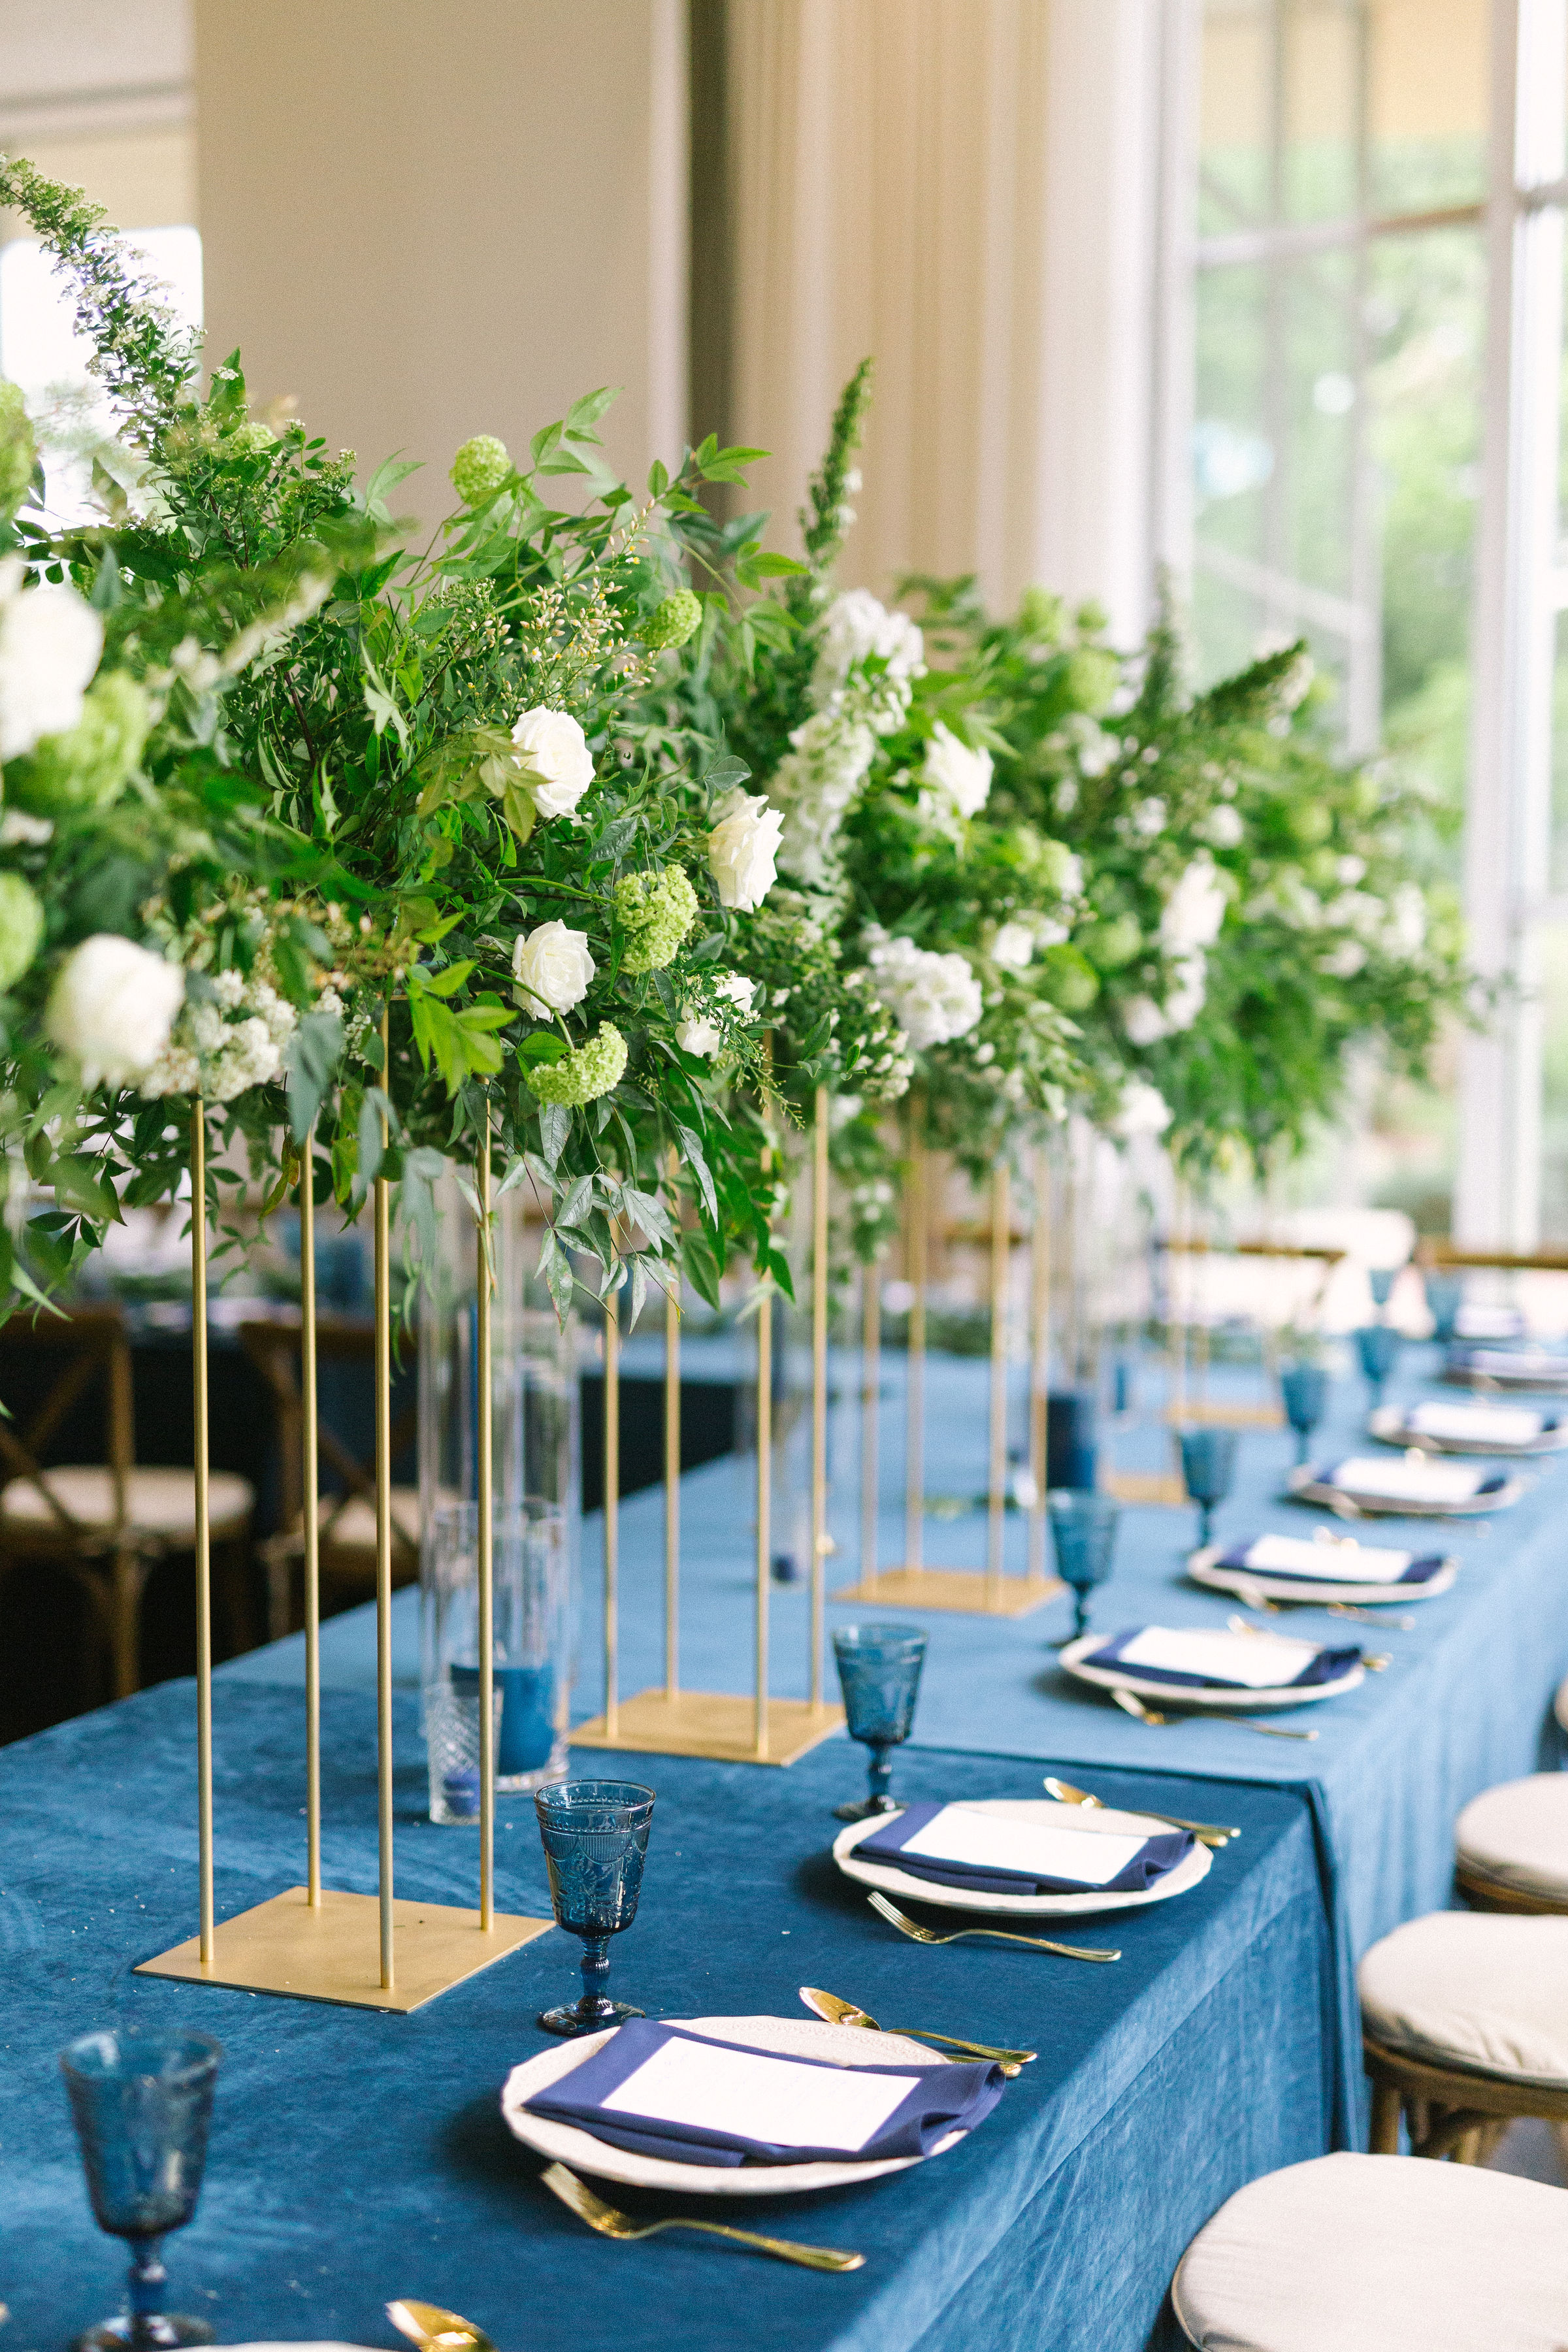 Ellen-Ashton-Photography-Dallas-Wedding-Photographers-Ivory-and-vine-Weddings-845.jpg